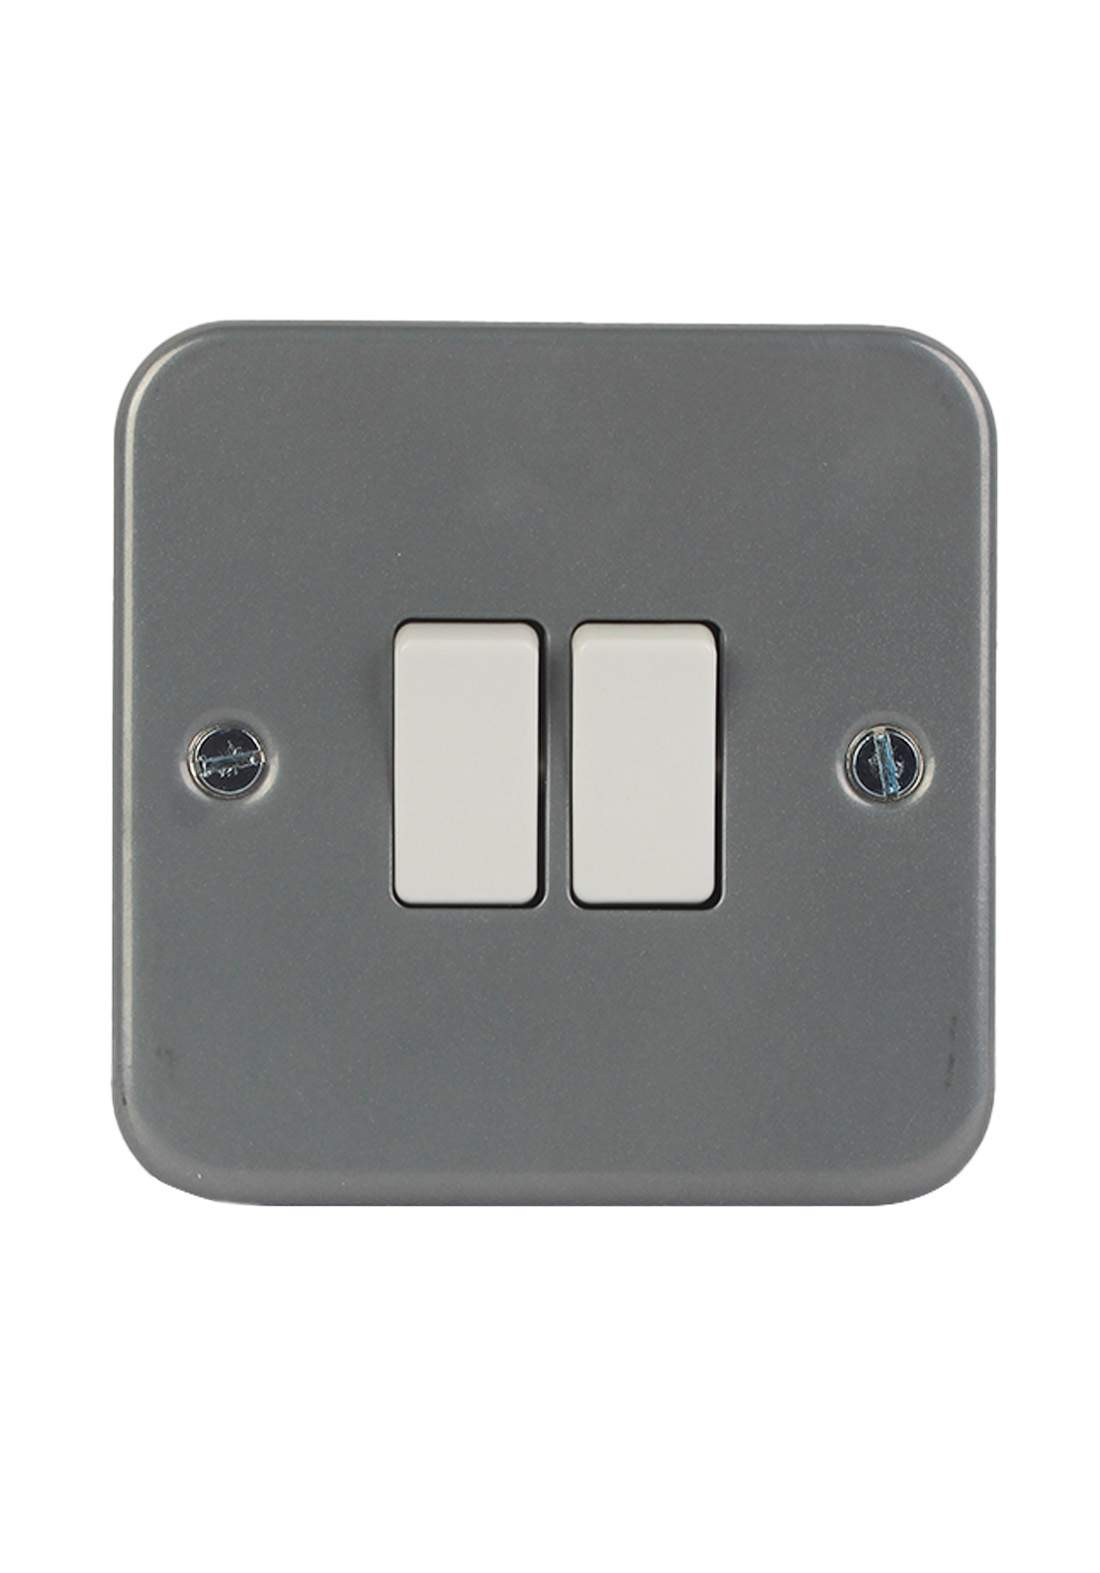 Bg MC542 Switch 10A مفتاح كهربائي (بلك)